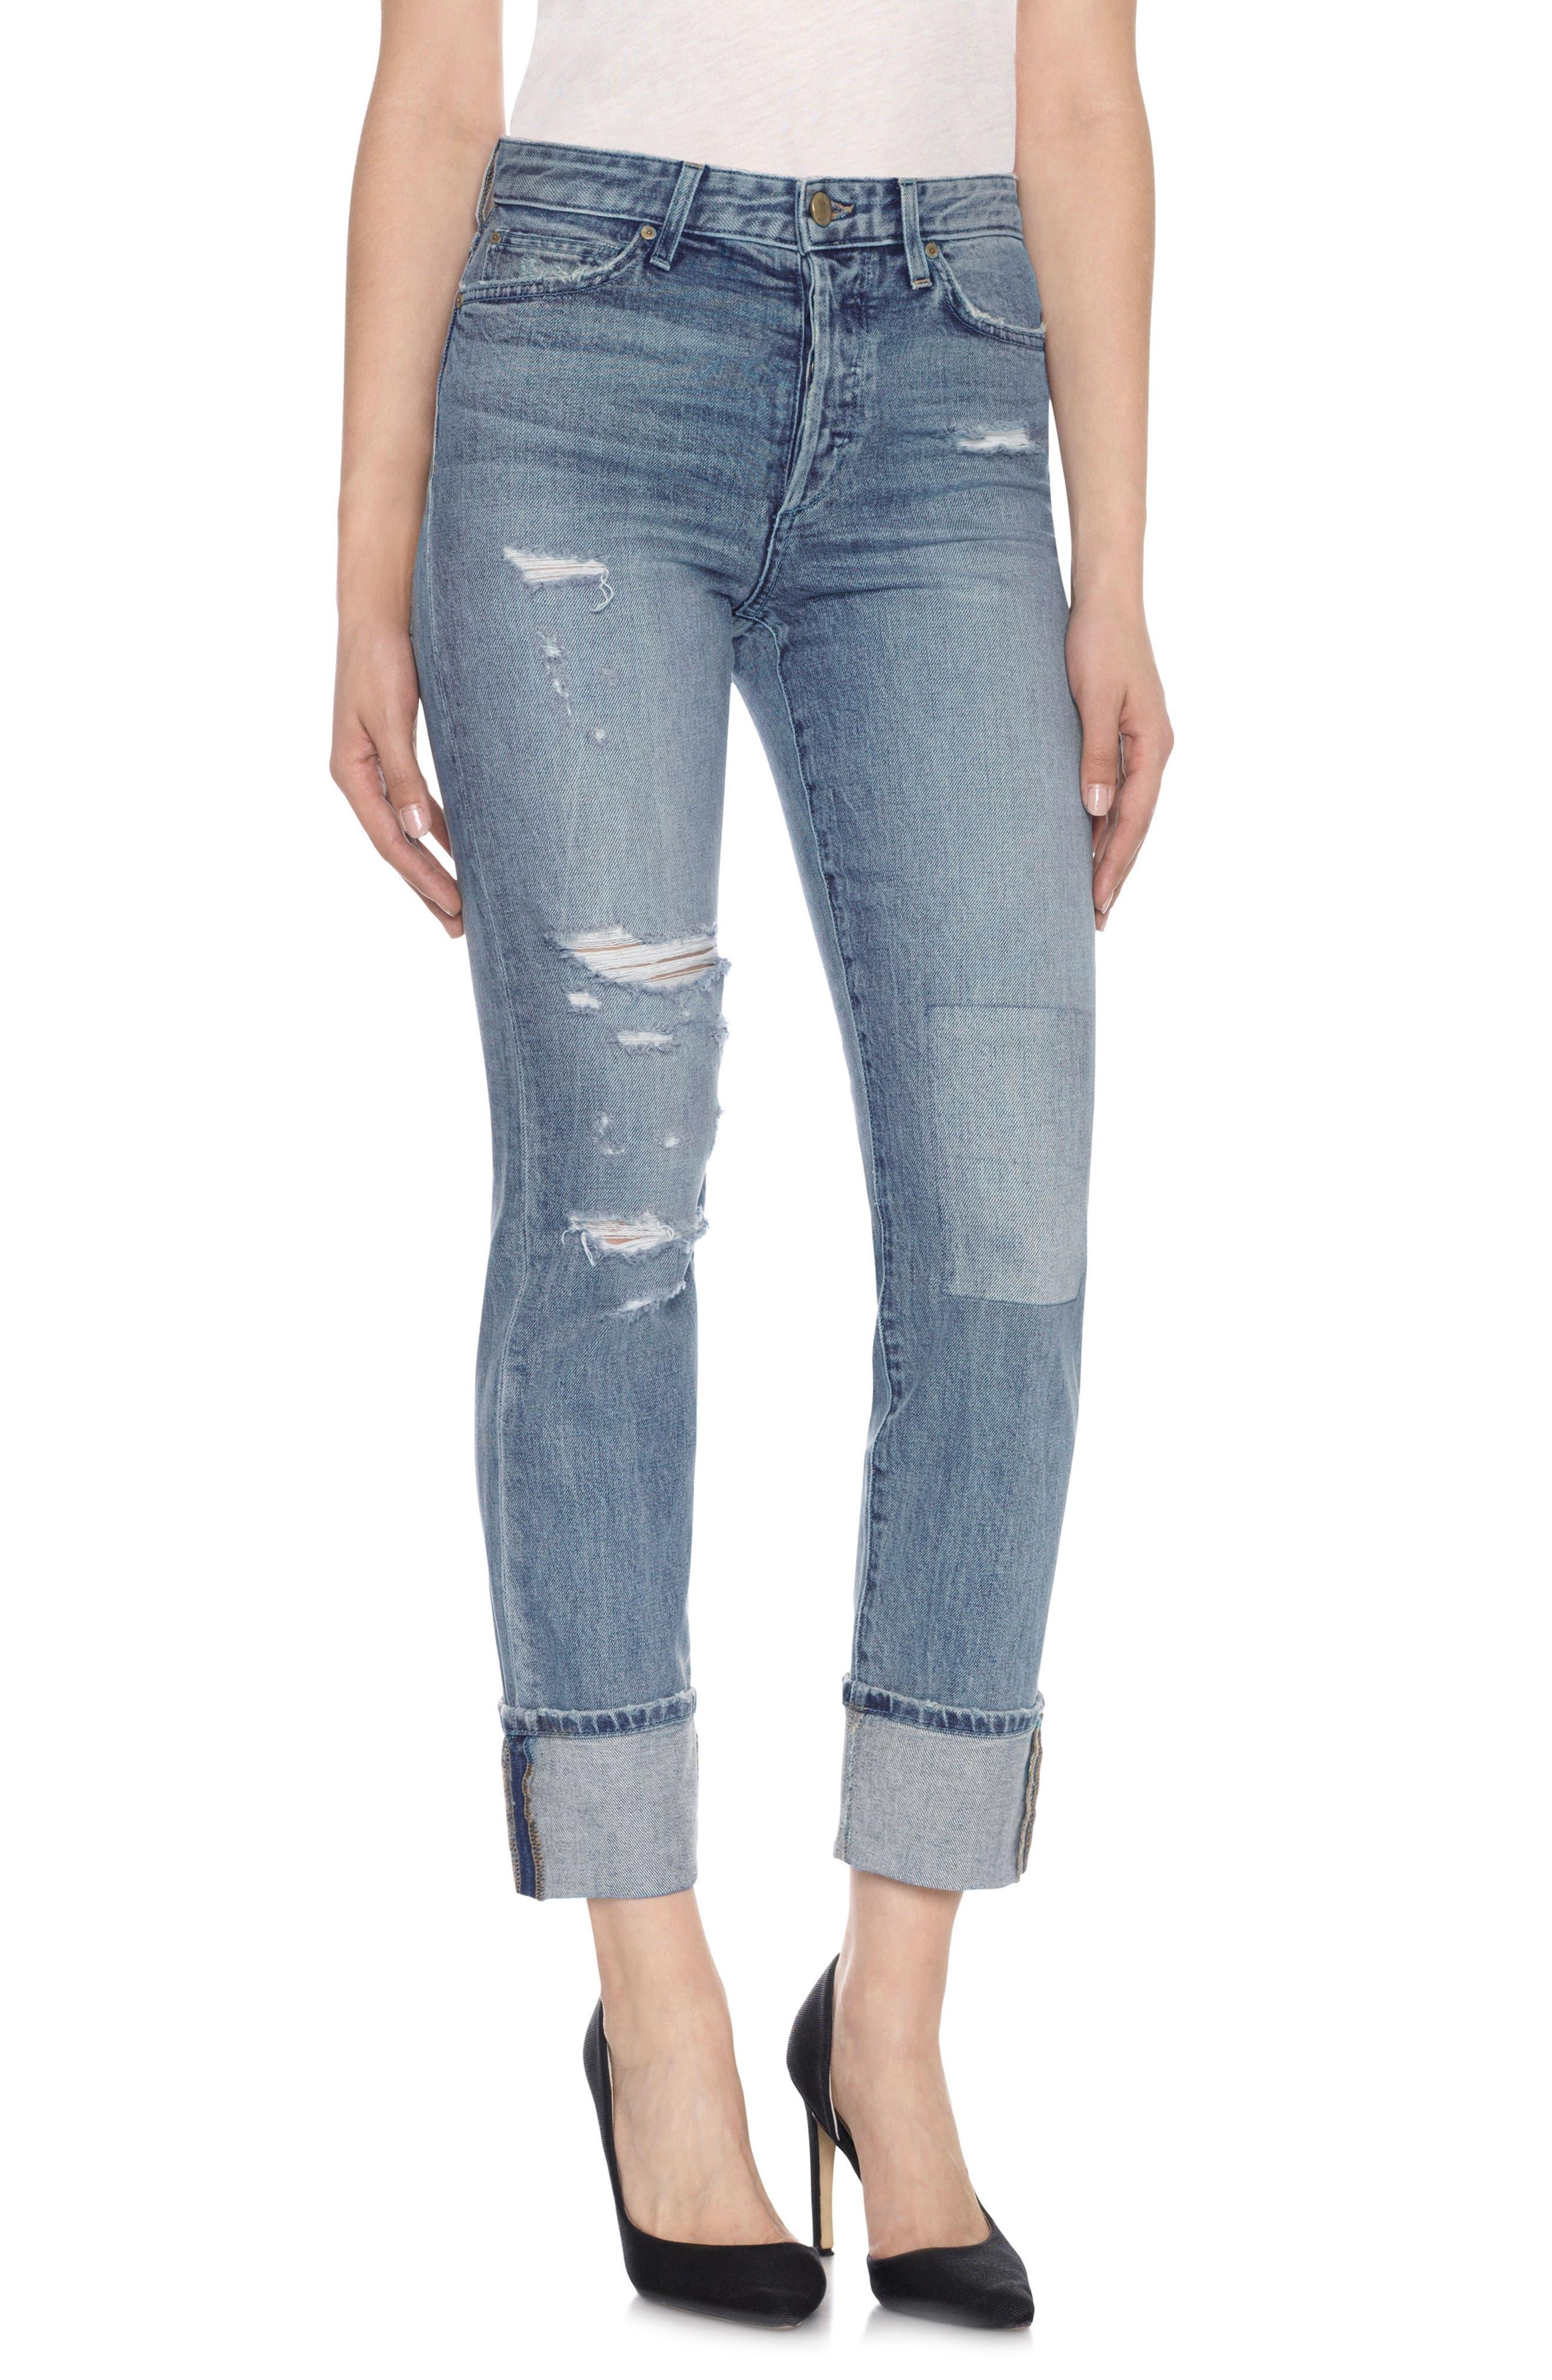 Taylor Hill x Joe's Debbie Cuff Straight Leg Jeans,                         Main,                         color, 430